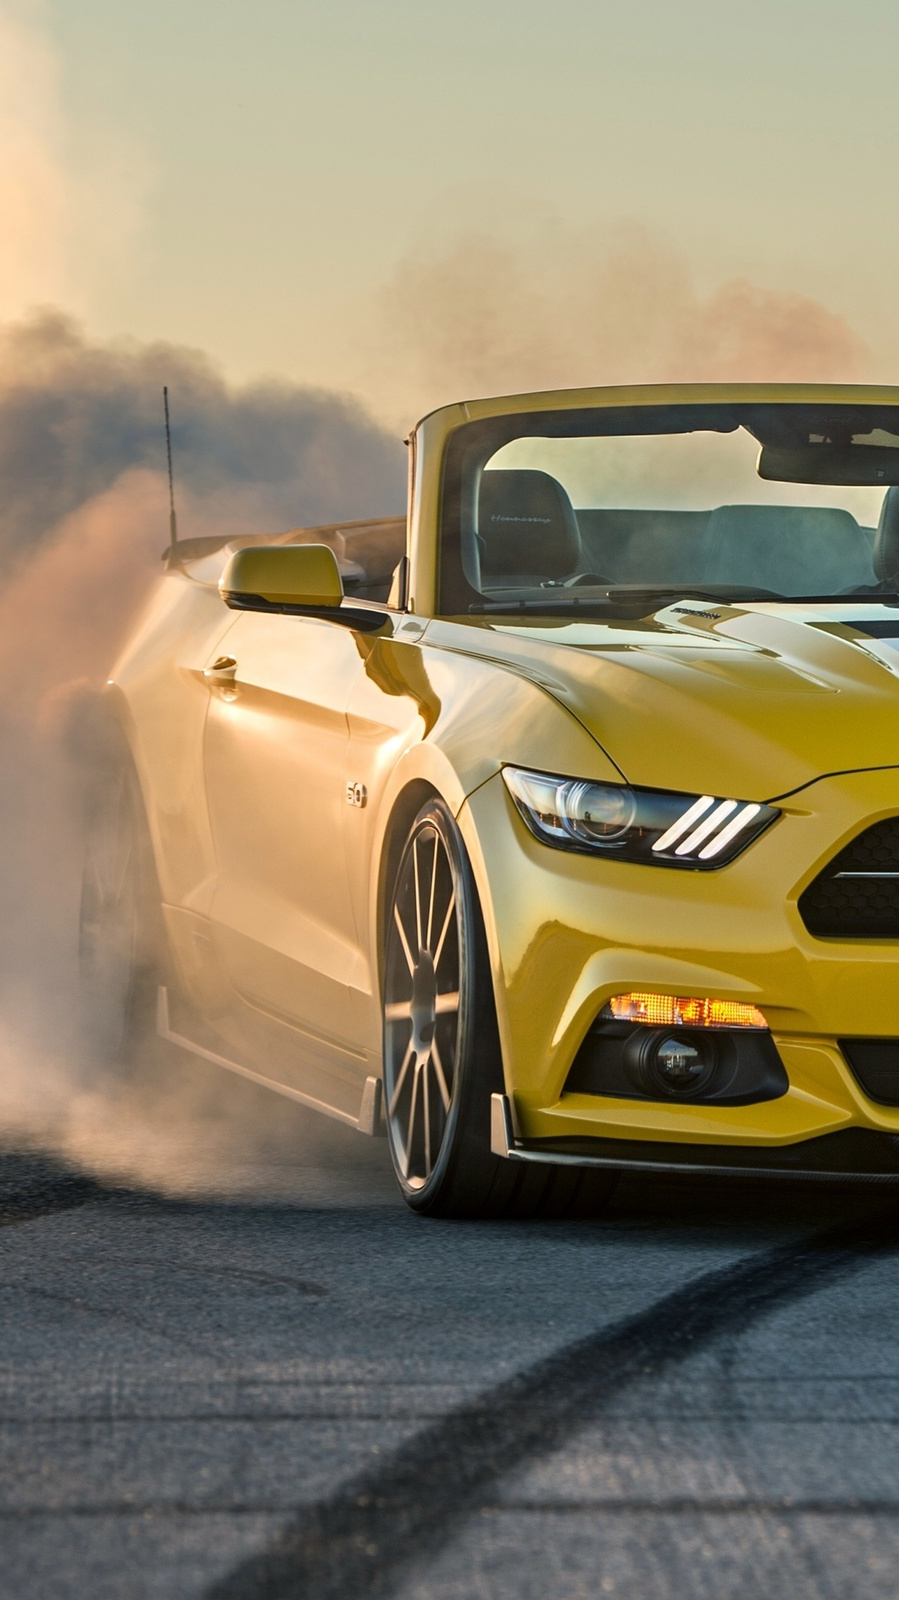 Iphone Wallpaper Muscle Car Ford Mustang Gt Convertible Burnout Iphone Wallpaper